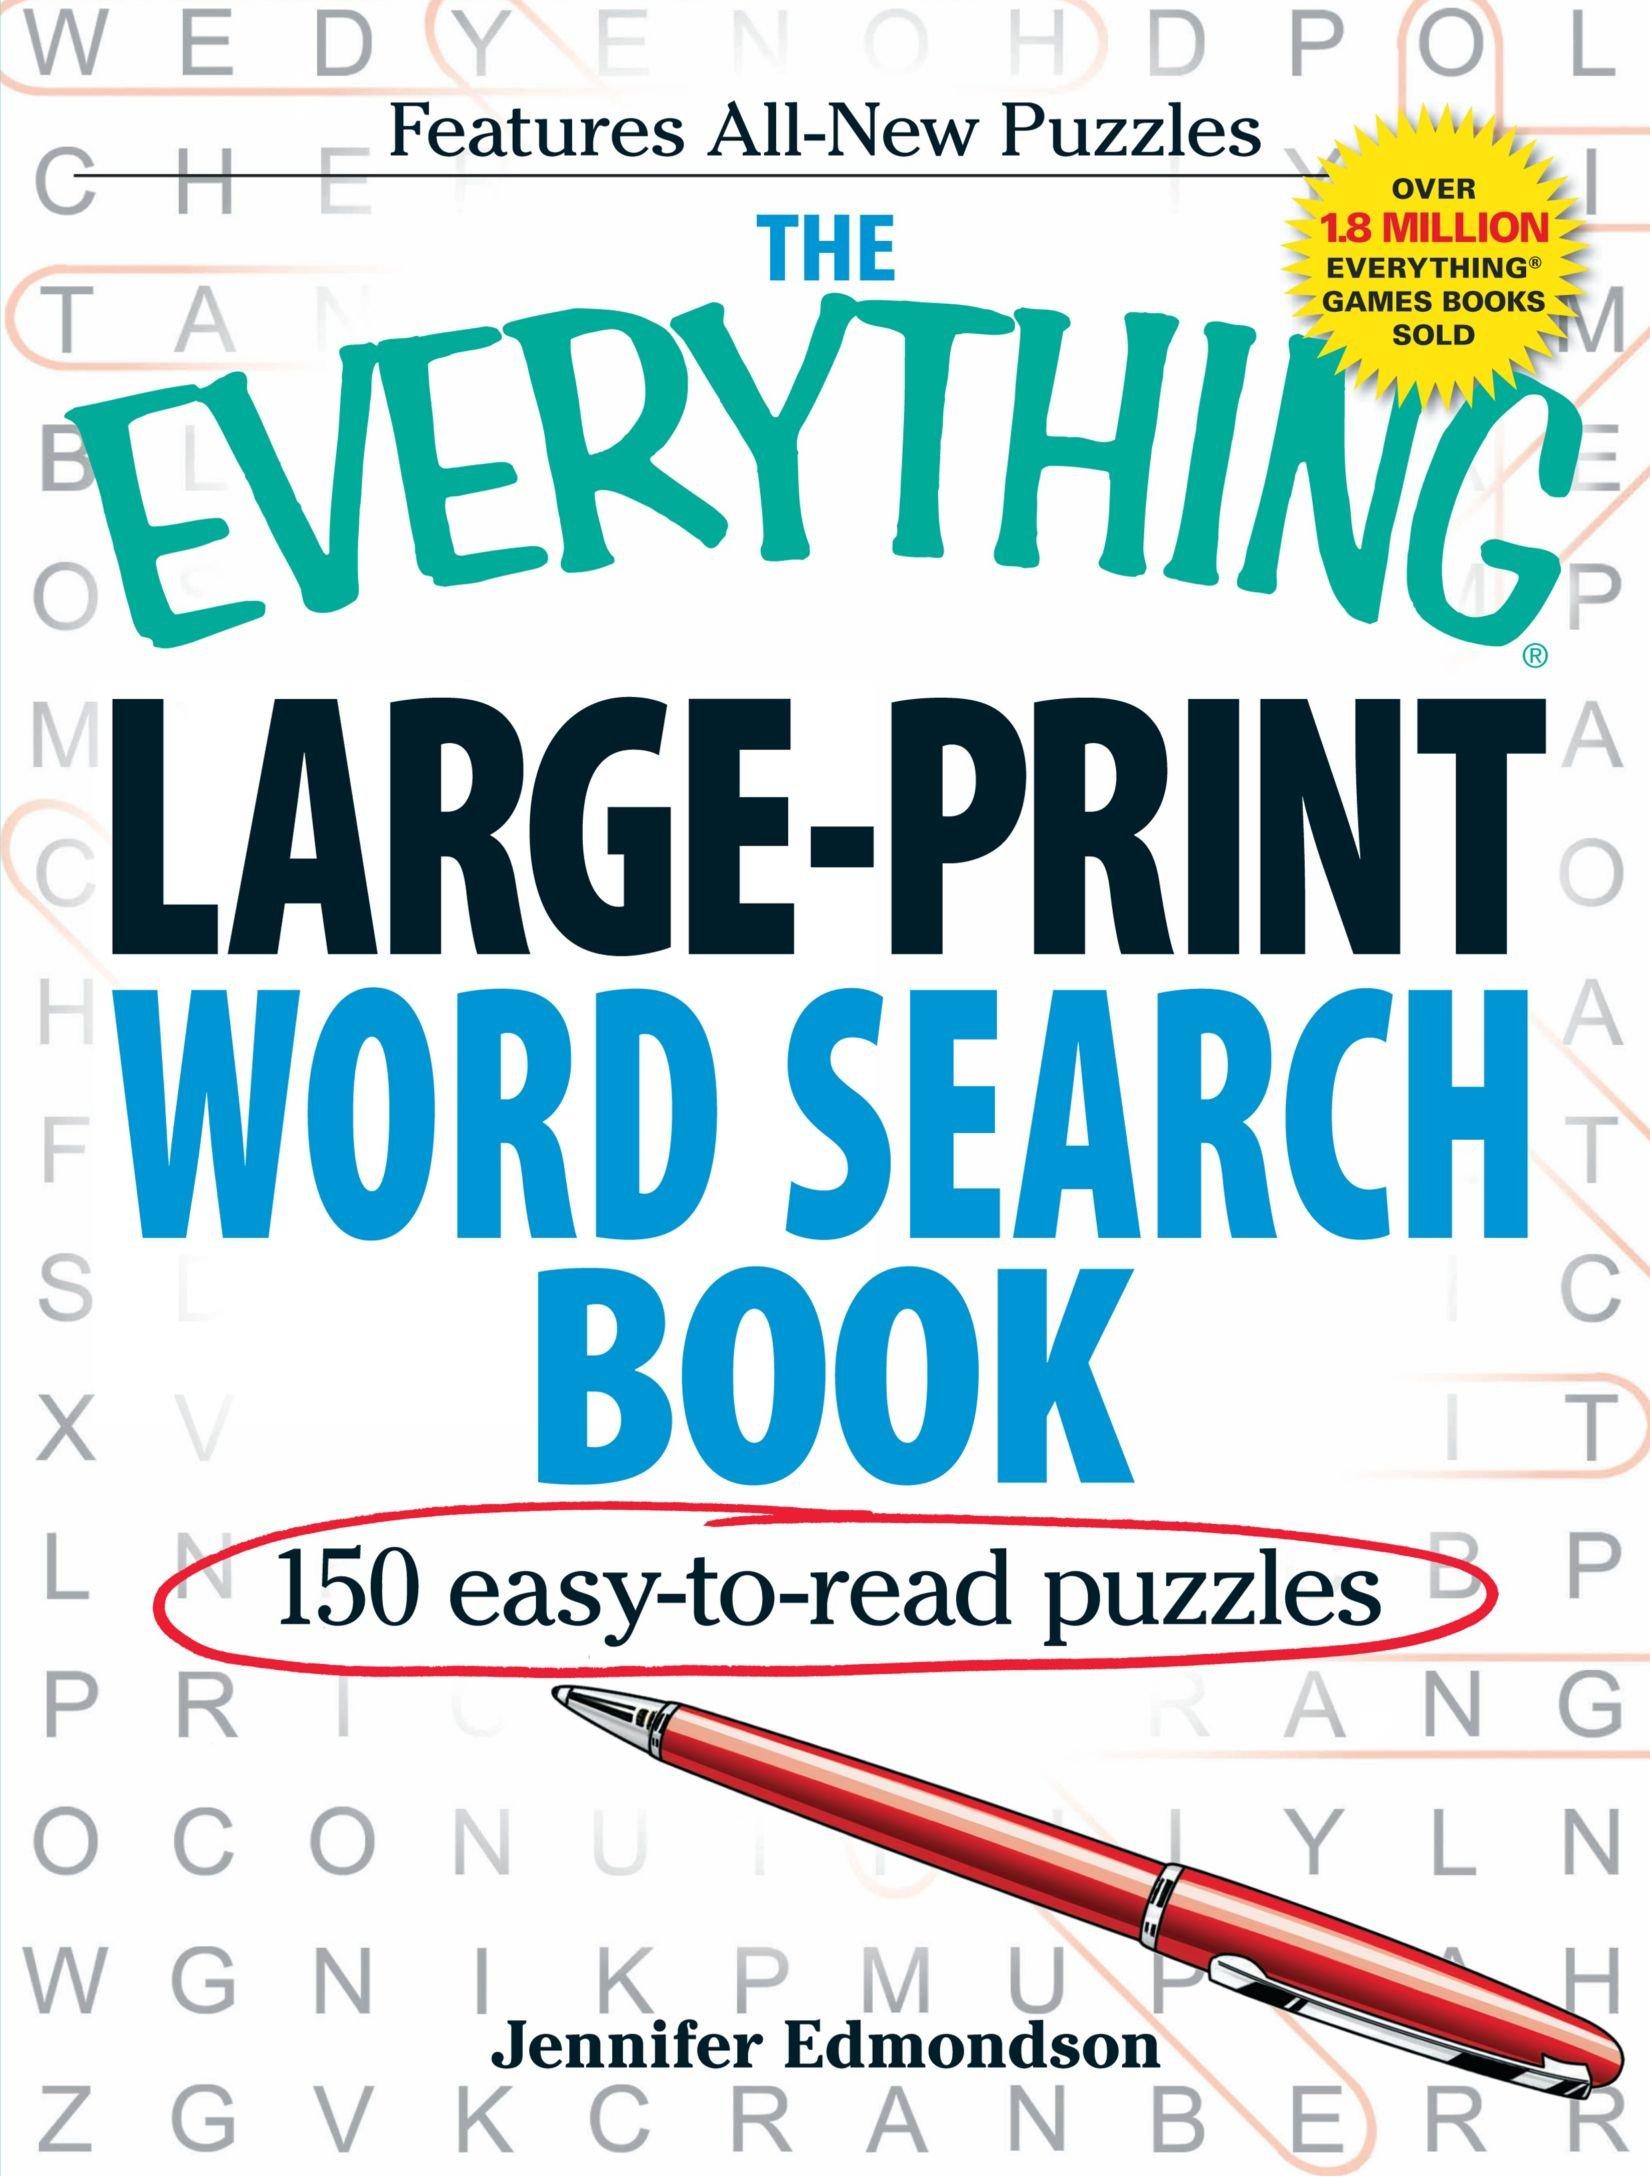 Large Print Word Search Printable